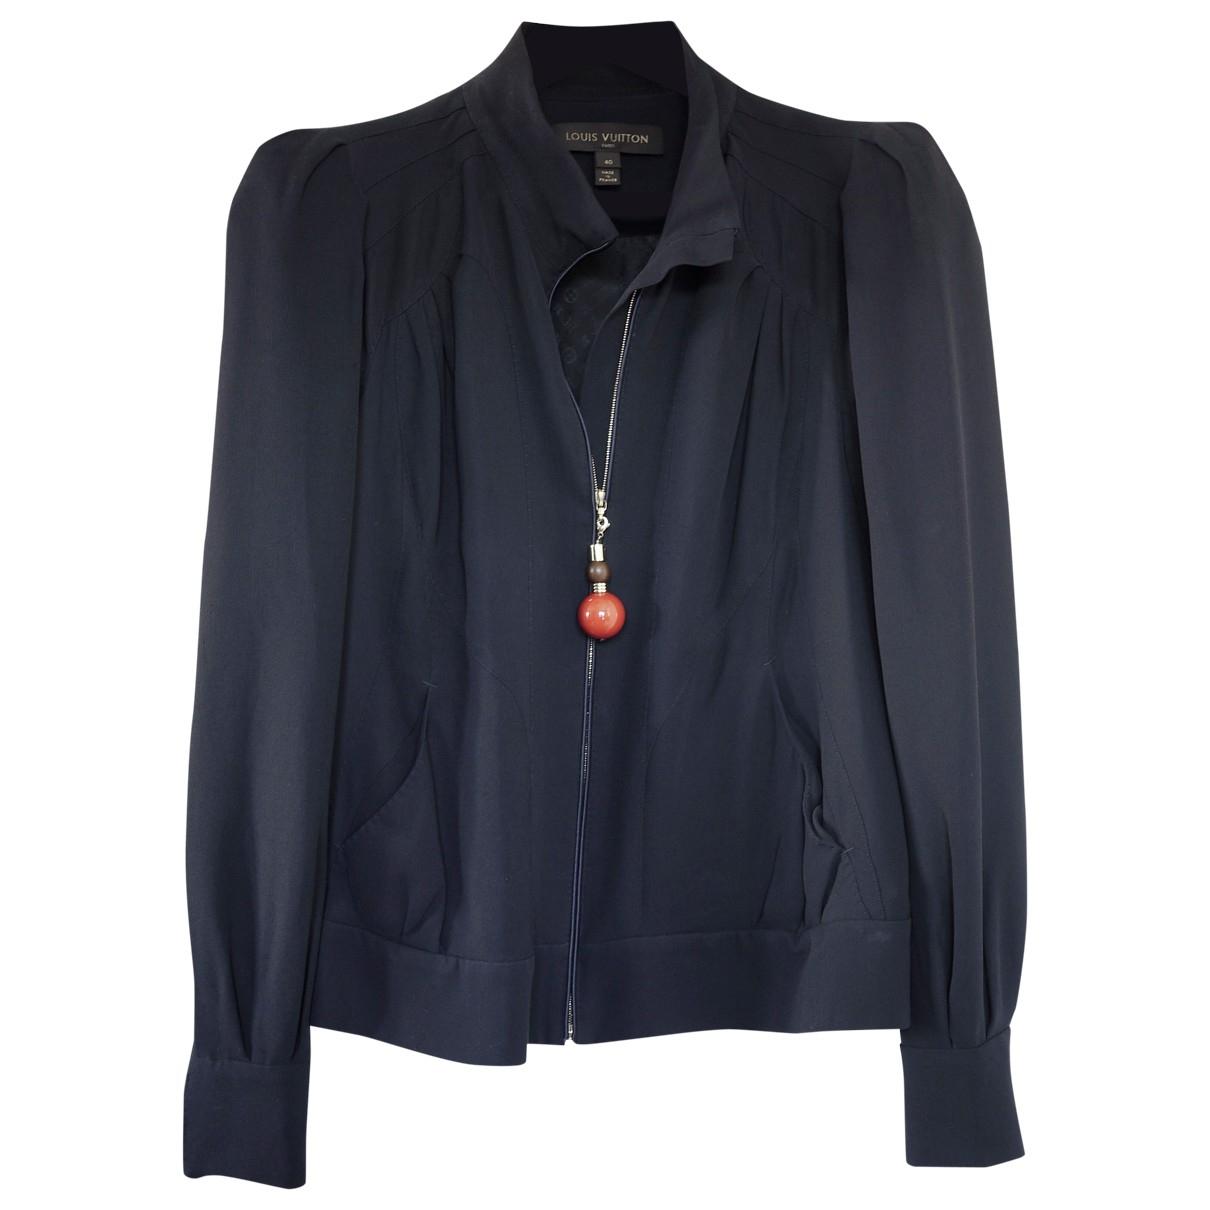 Louis Vuitton \N Navy Silk jacket for Women 40 FR